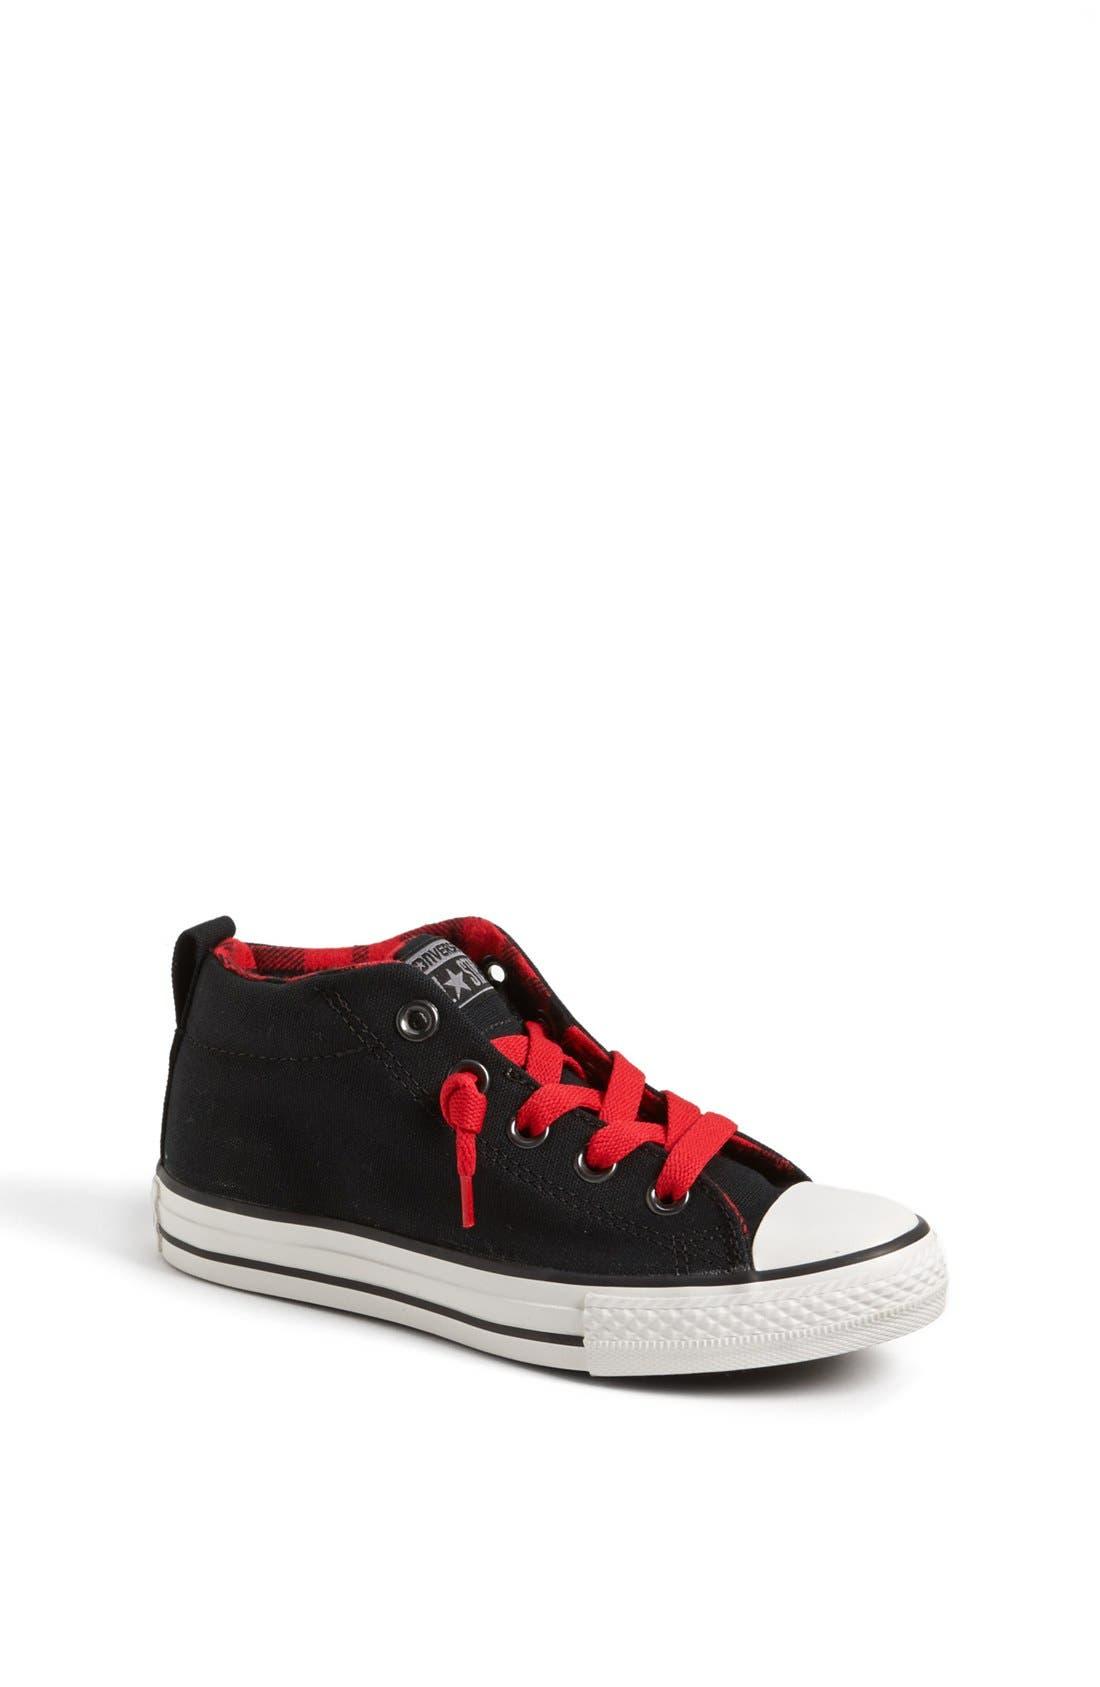 Alternate Image 1 Selected - Converse Chuck Taylor® 'CT AS Street' Slip-On Sneaker (Toddler, Little Kid & Big Kid)